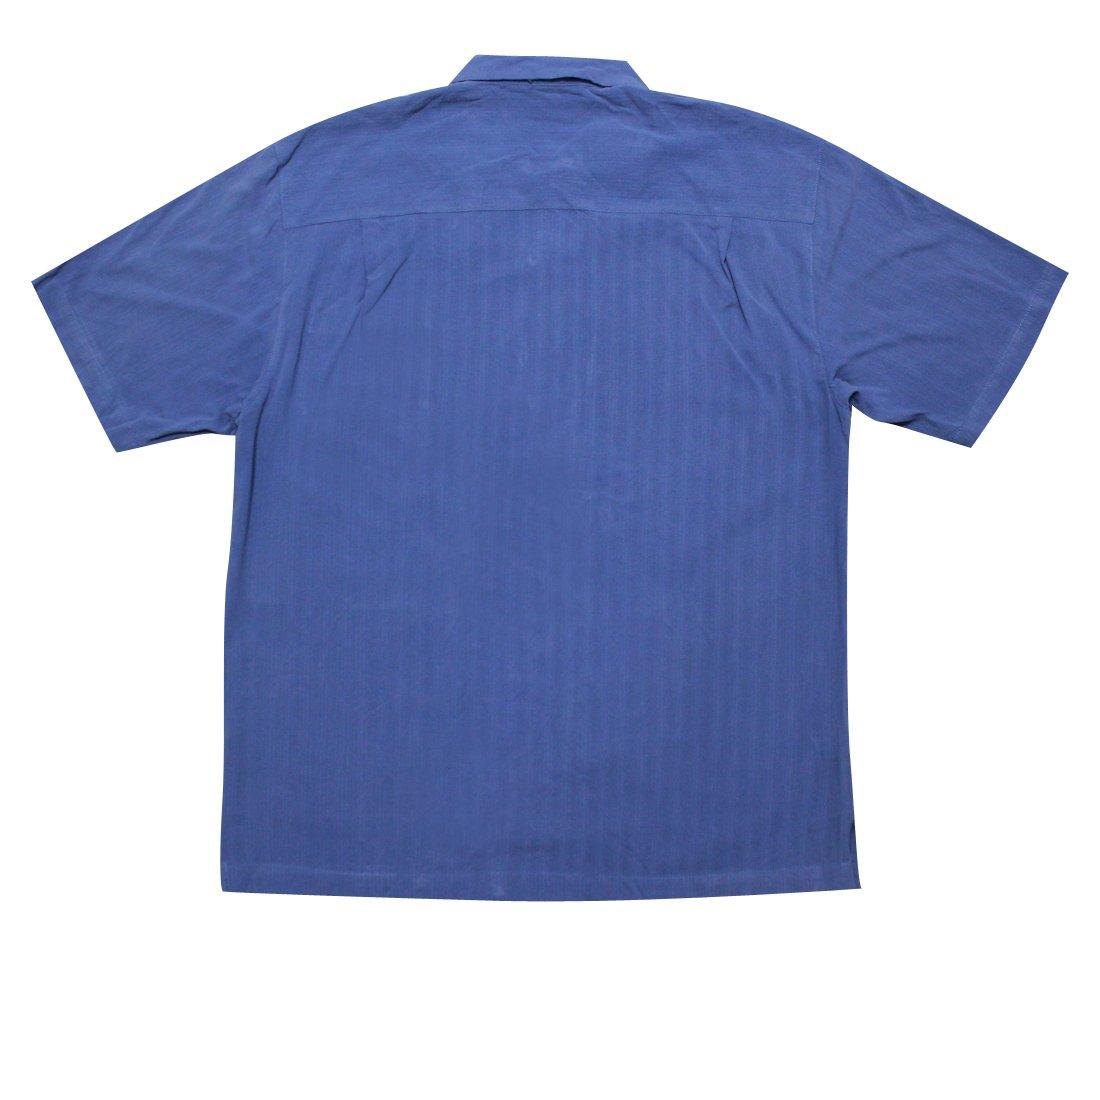 2ba52342 Tommy Bahama Big & Tall Mens Light Weight Silk, Summer Camp Shirt XXL Blue  at Amazon Men's Clothing store: